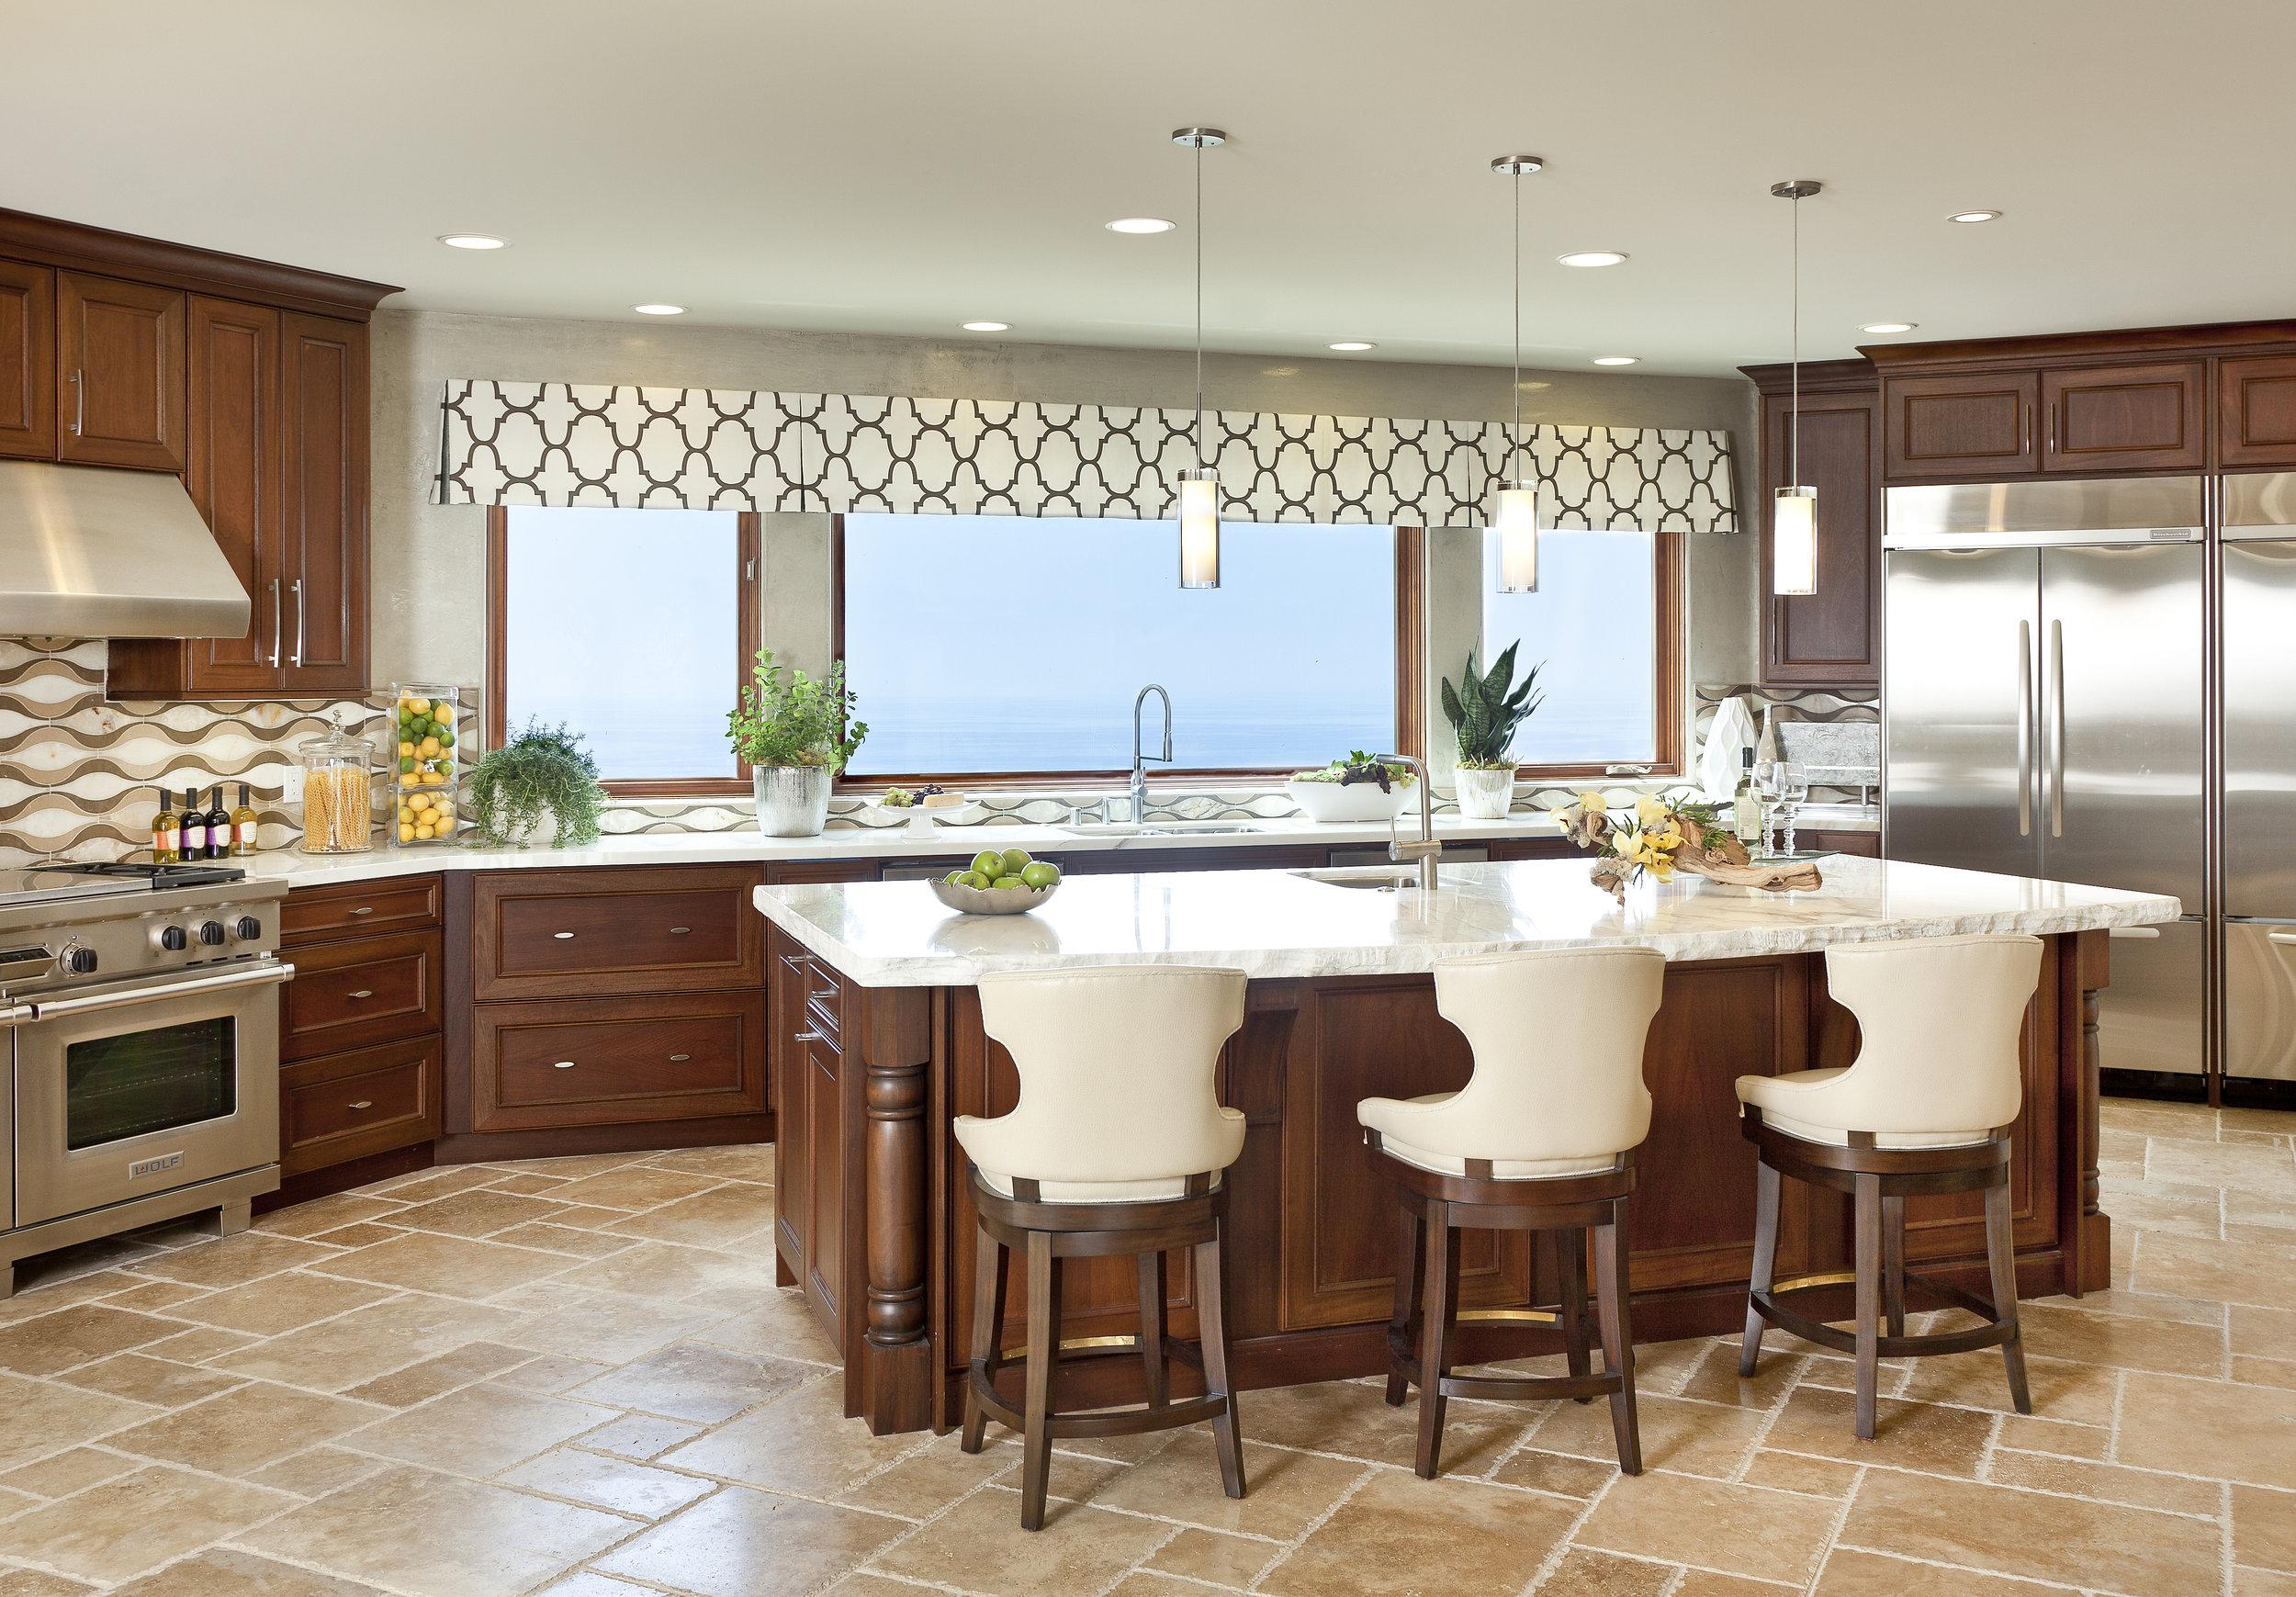 Design House Kitchen- Use for Publication.jpg